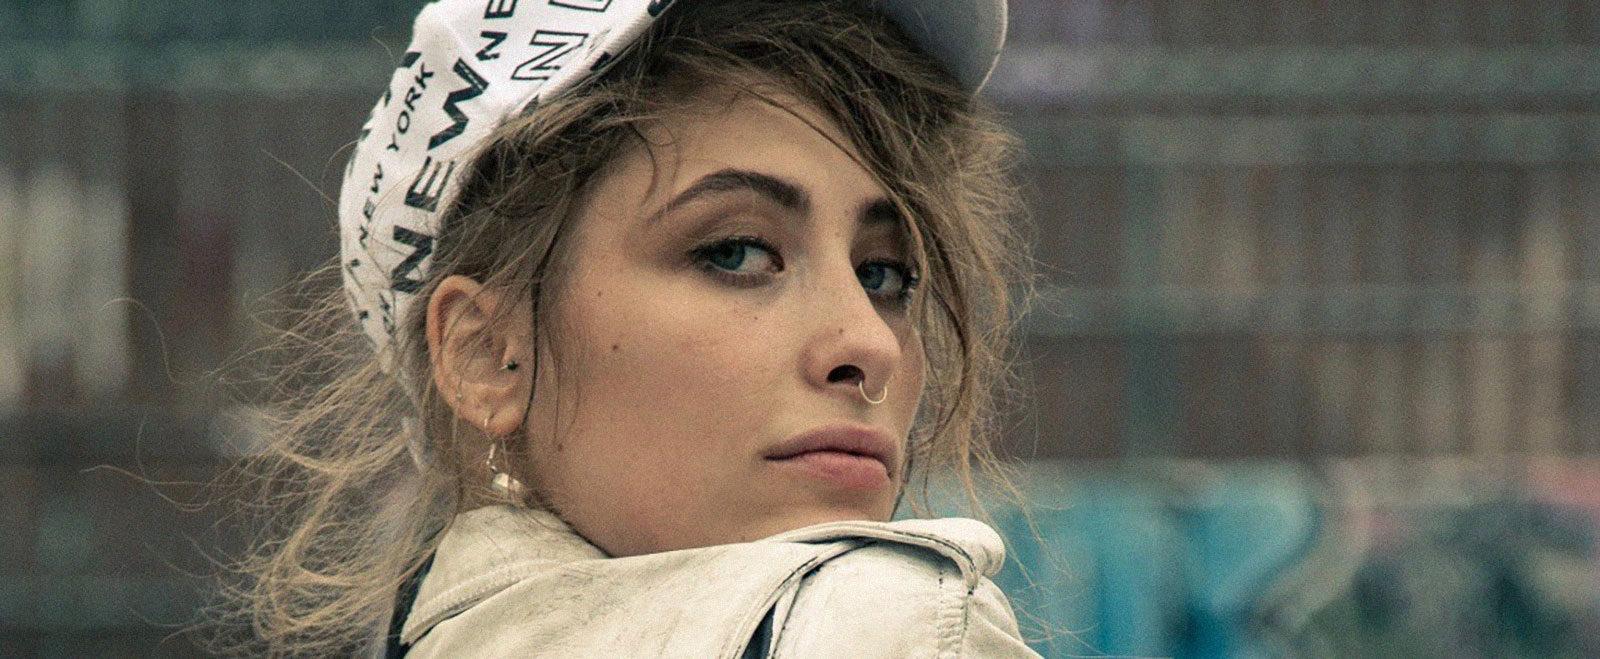 Samantha Urbani Interview GrandLife Leather Jacket Guide New York City Jakett Pop-up